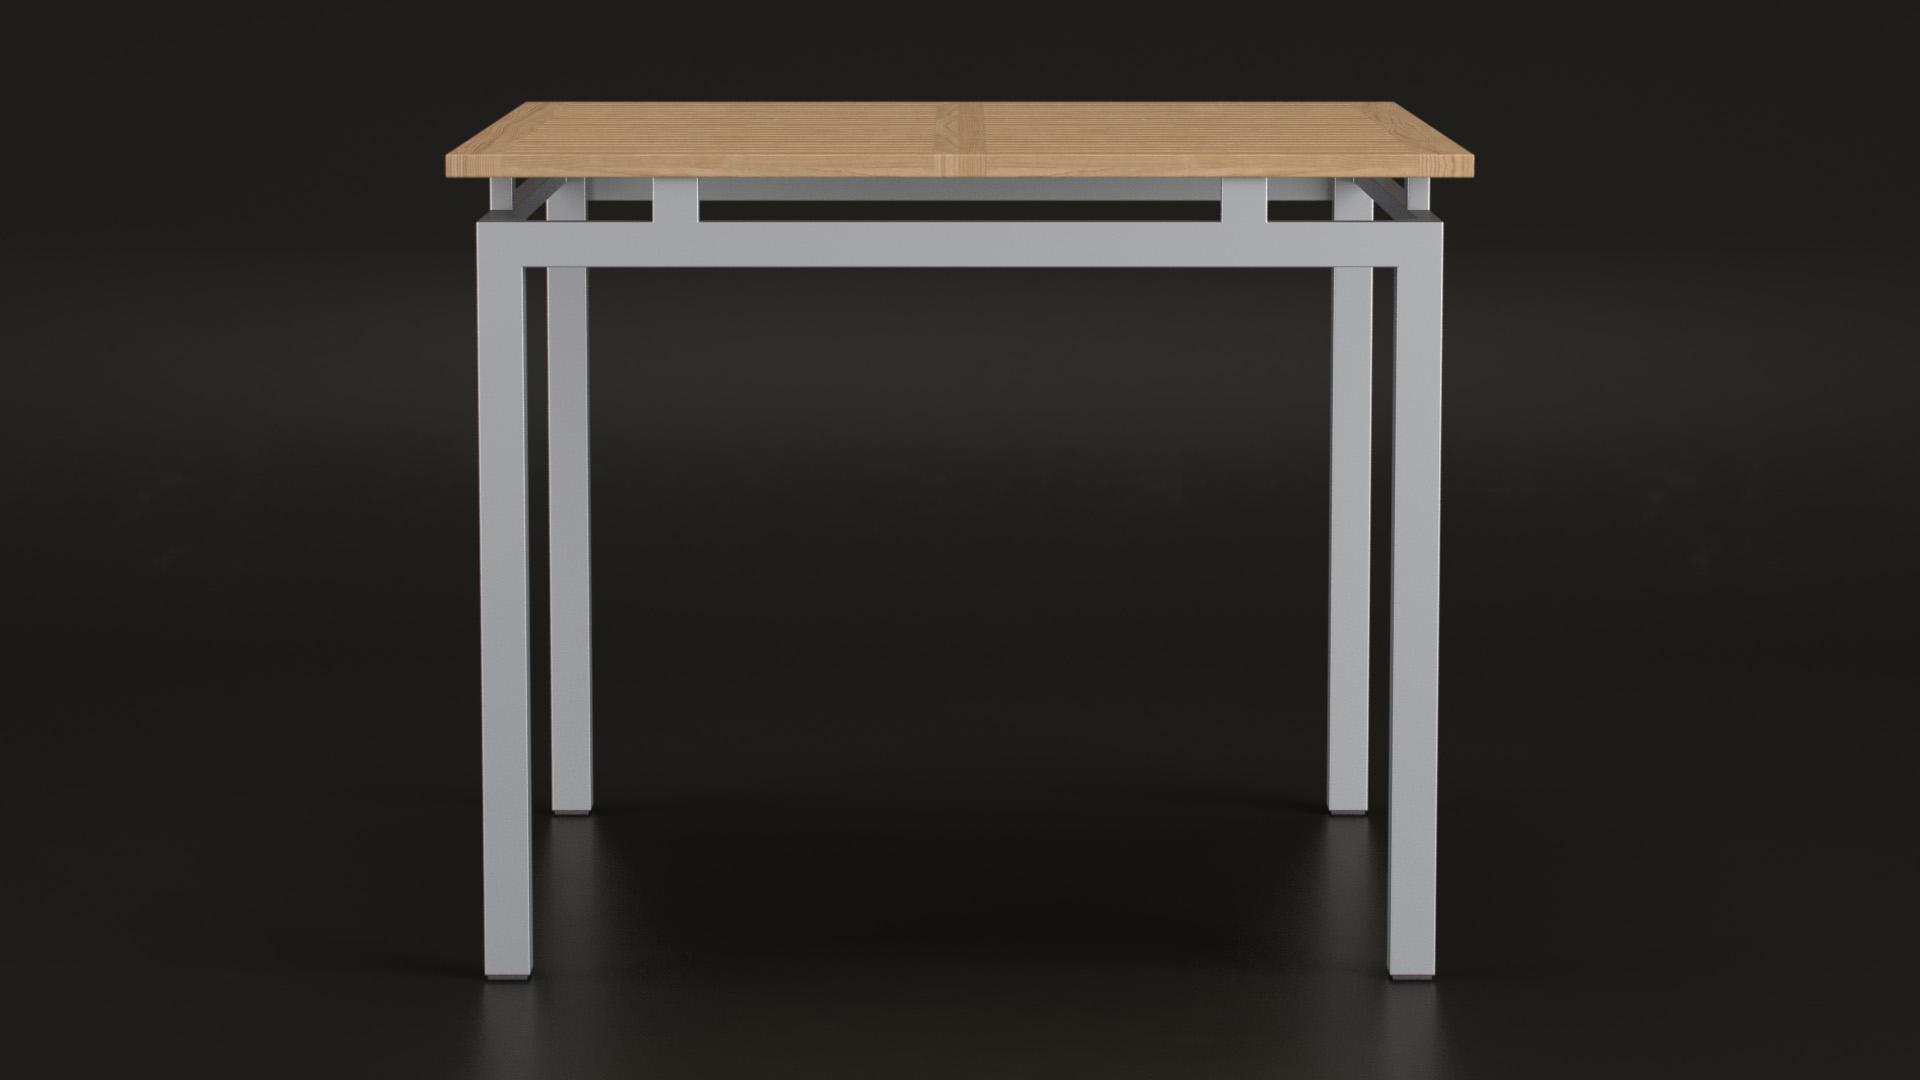 Alu_WoodGarden_Table_BlackSet_01_V1.01_0002